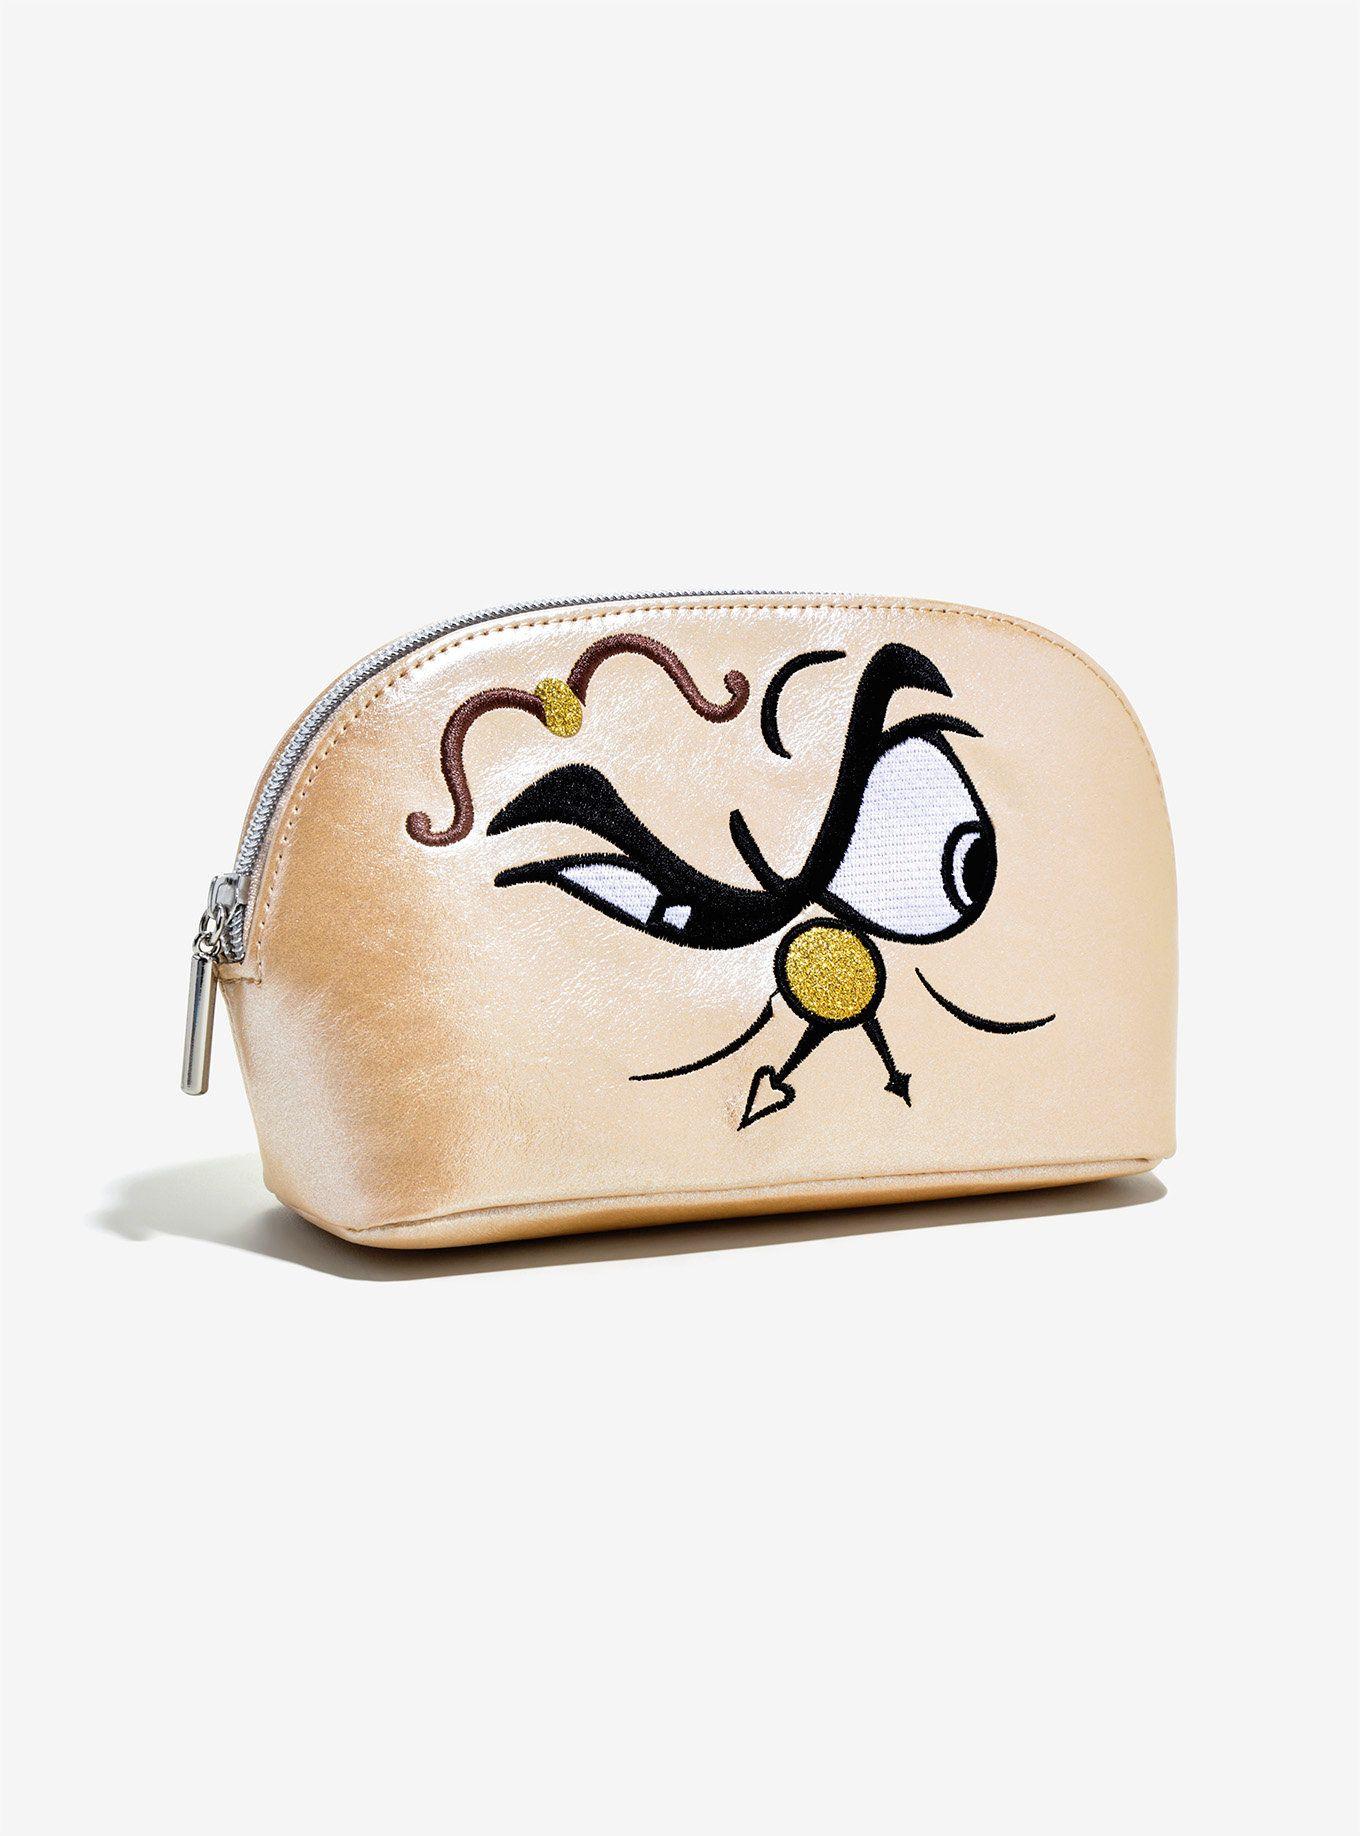 Danielle Nicole Disney Beauty And The Beast Cogsworth Makeup Bag